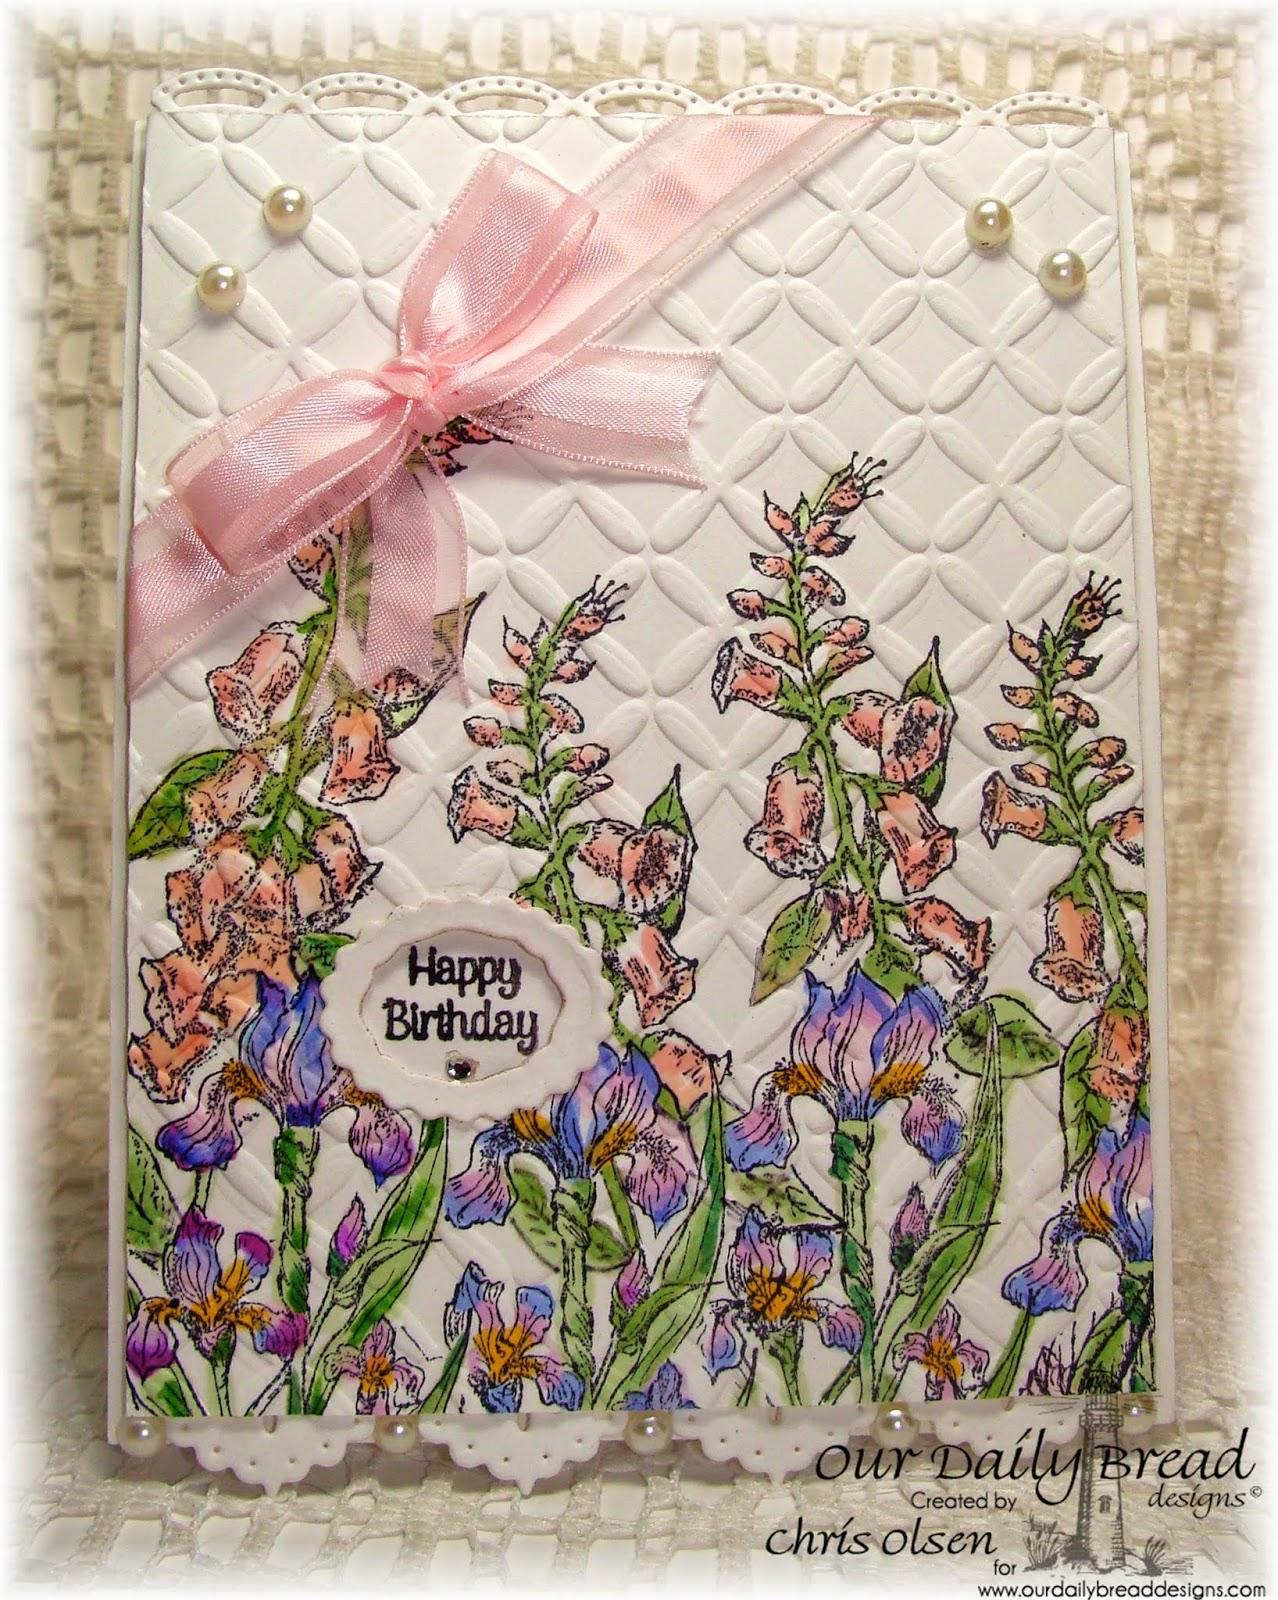 Our Daily Bread Designs, Happy Birthday, Peaches, Foxglove, Bloom, Iris, Elegant Ovals die, Beautiful Borders die, designer- Chris Olsen